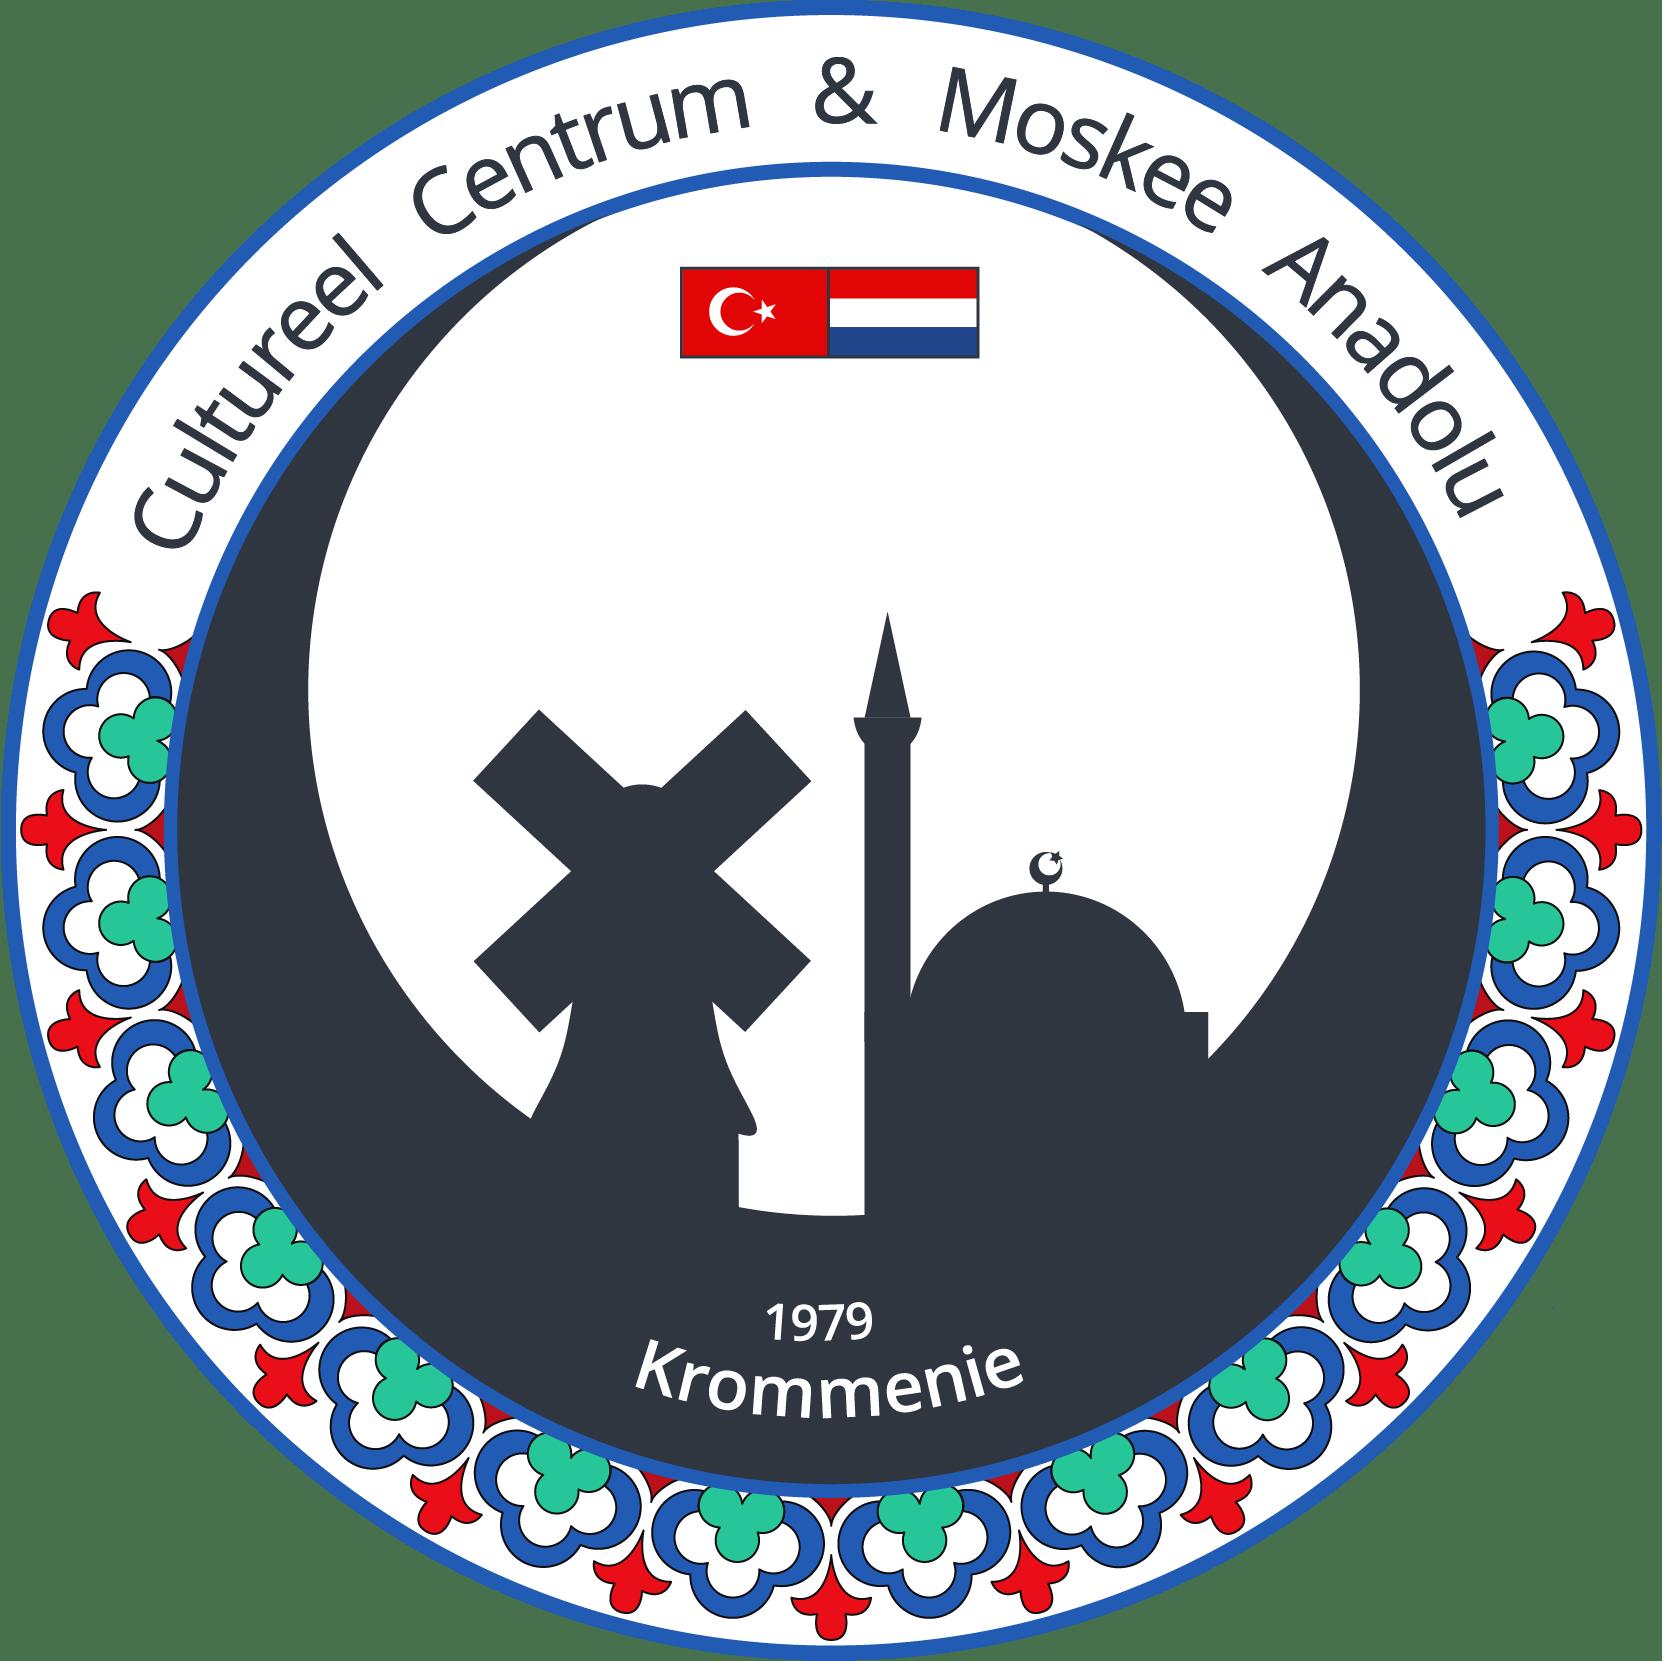 Cultureel Centrum & Moskee Anadolu